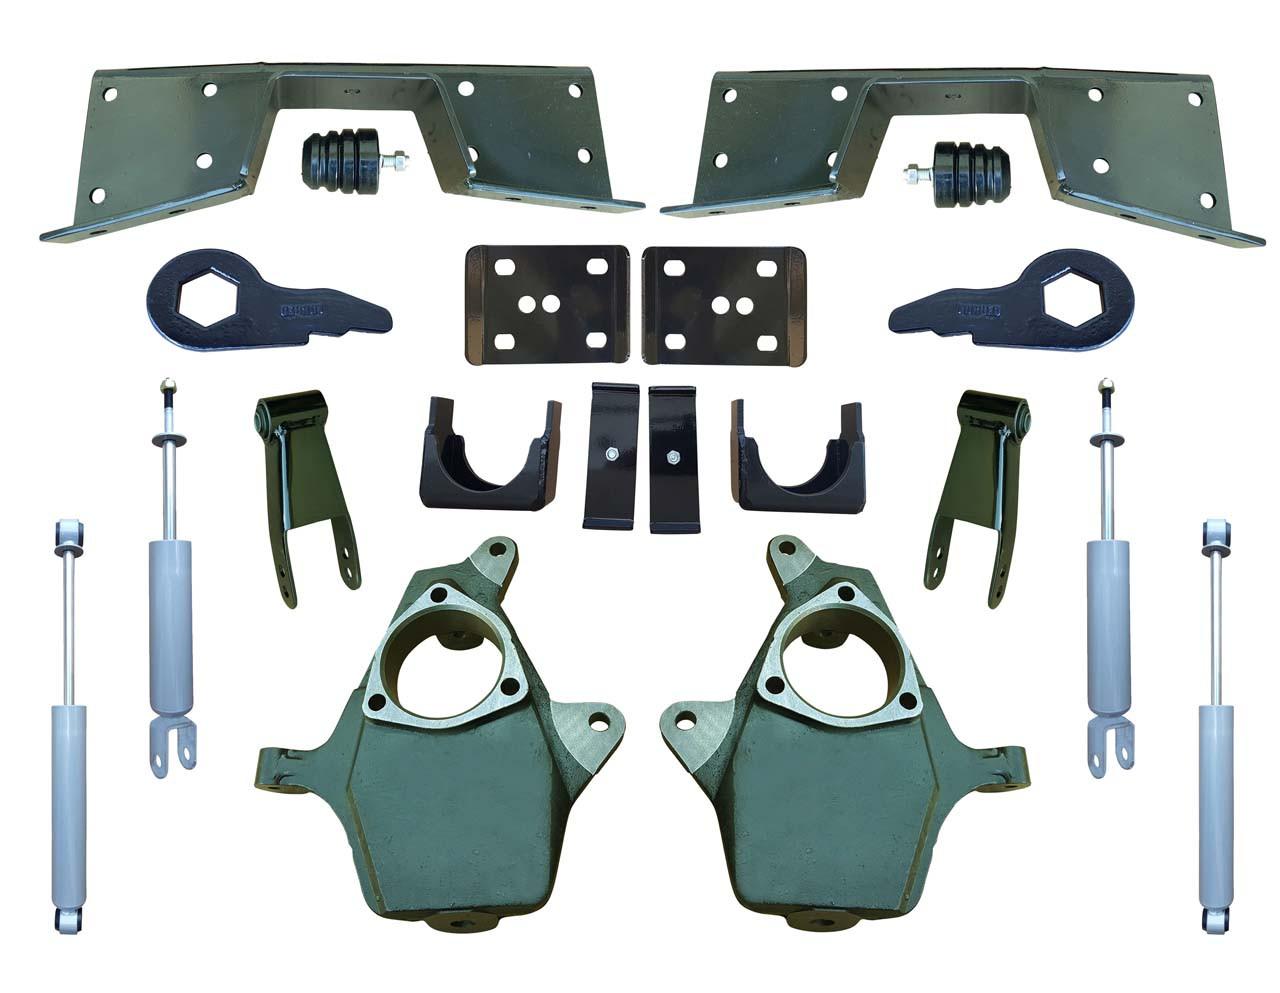 Complete 4-5/7 Lowering Kit for 99-00 Silverado / Sierra 4WD